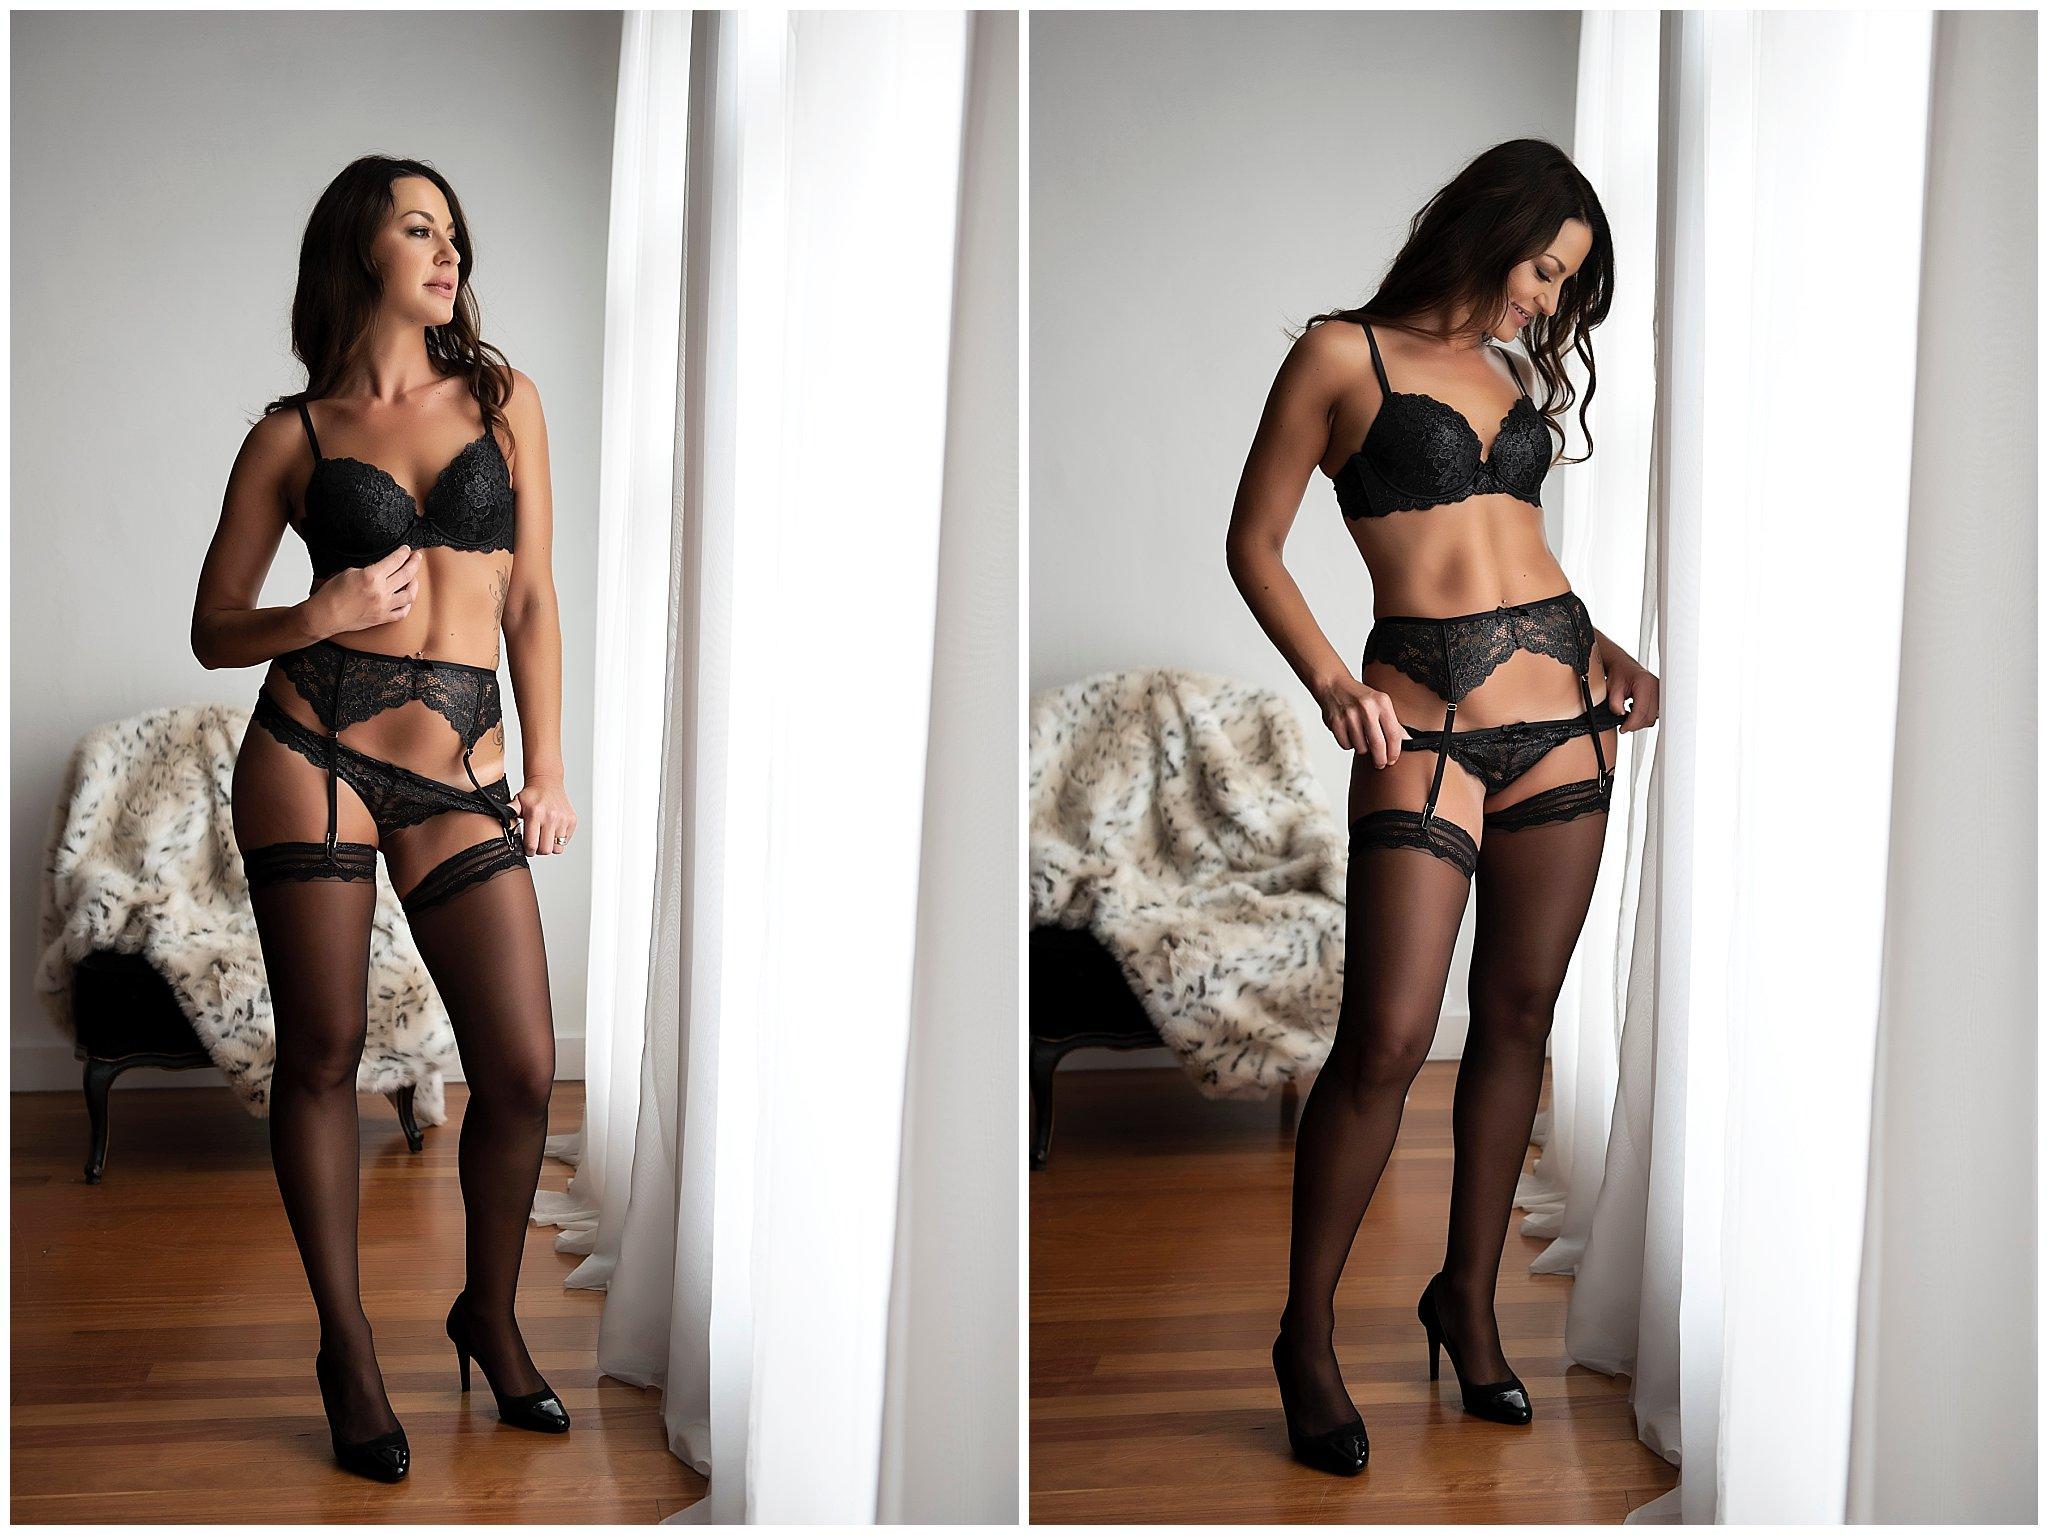 Intimate-boudoir-photoshoot-001.jpg